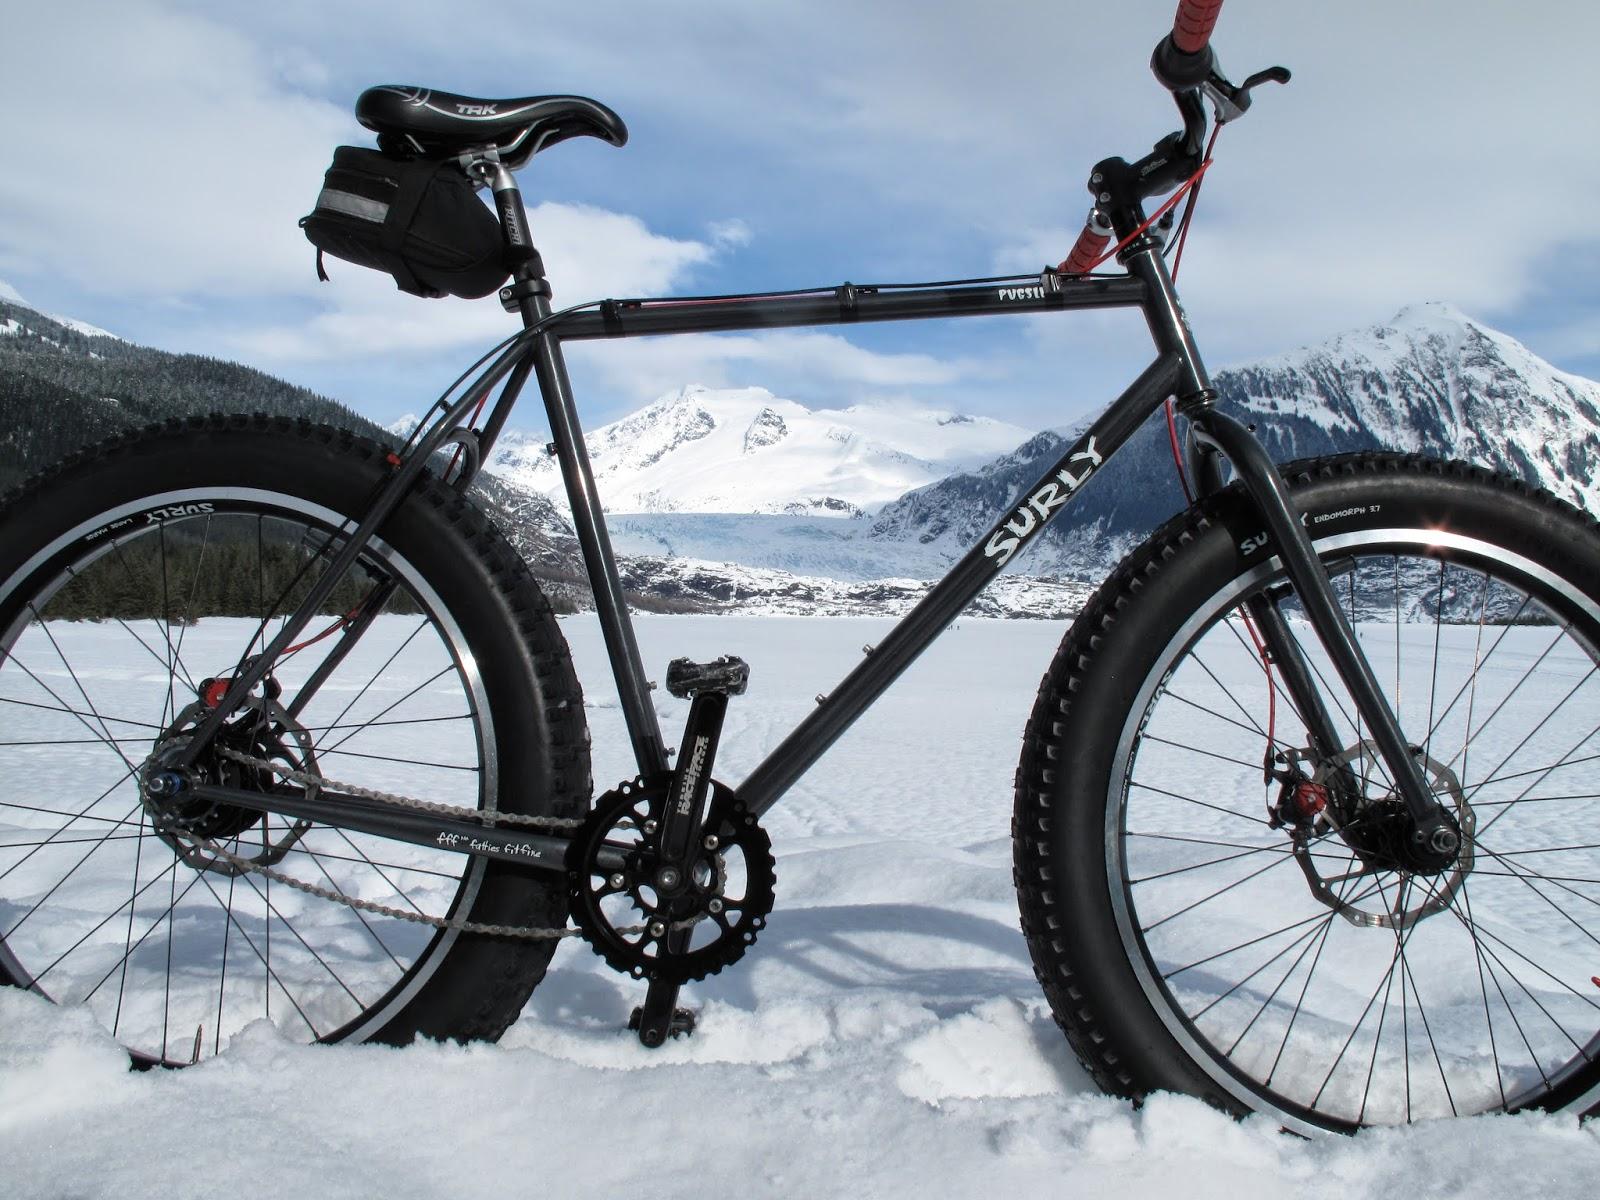 Biciak Budget Pugsley Fat Bike Upgrade To 9zero7 With Origin8